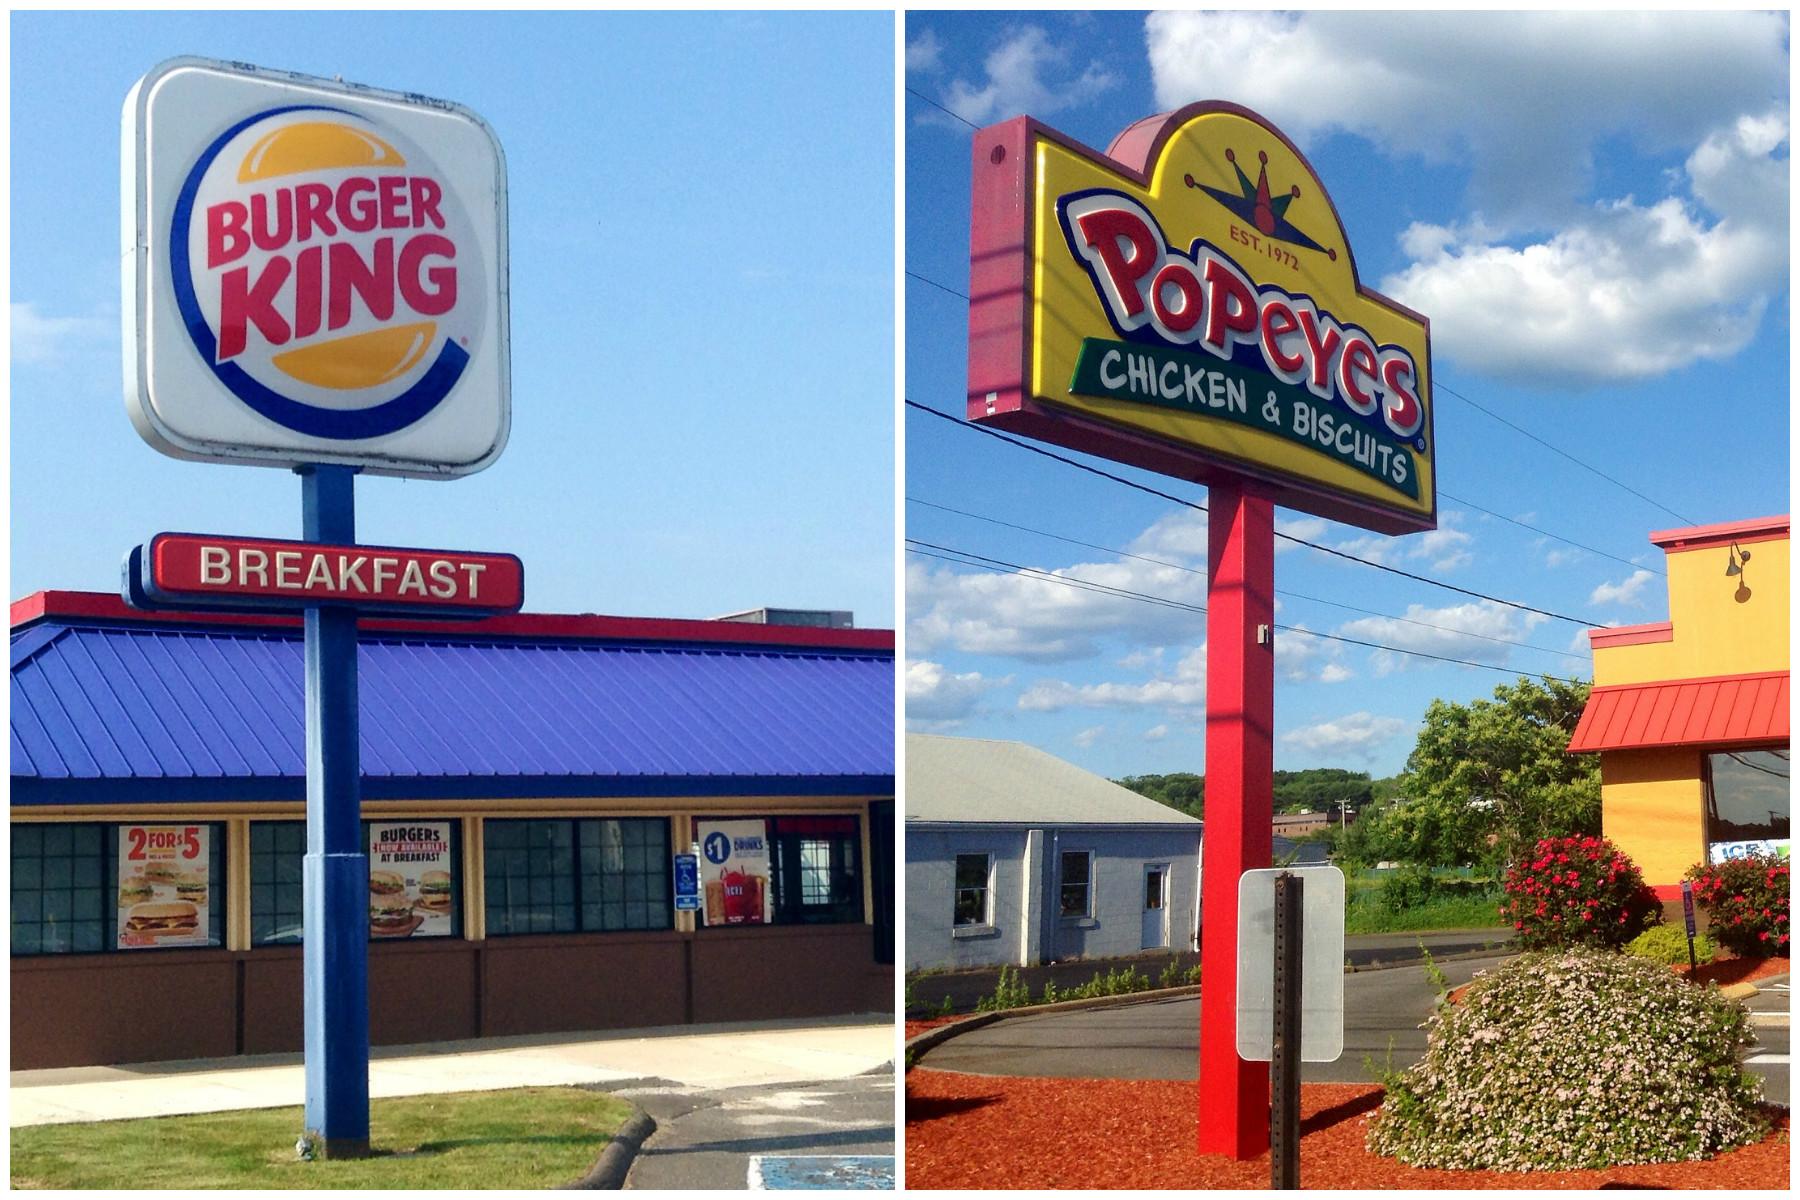 Burger King and Popeyes signs